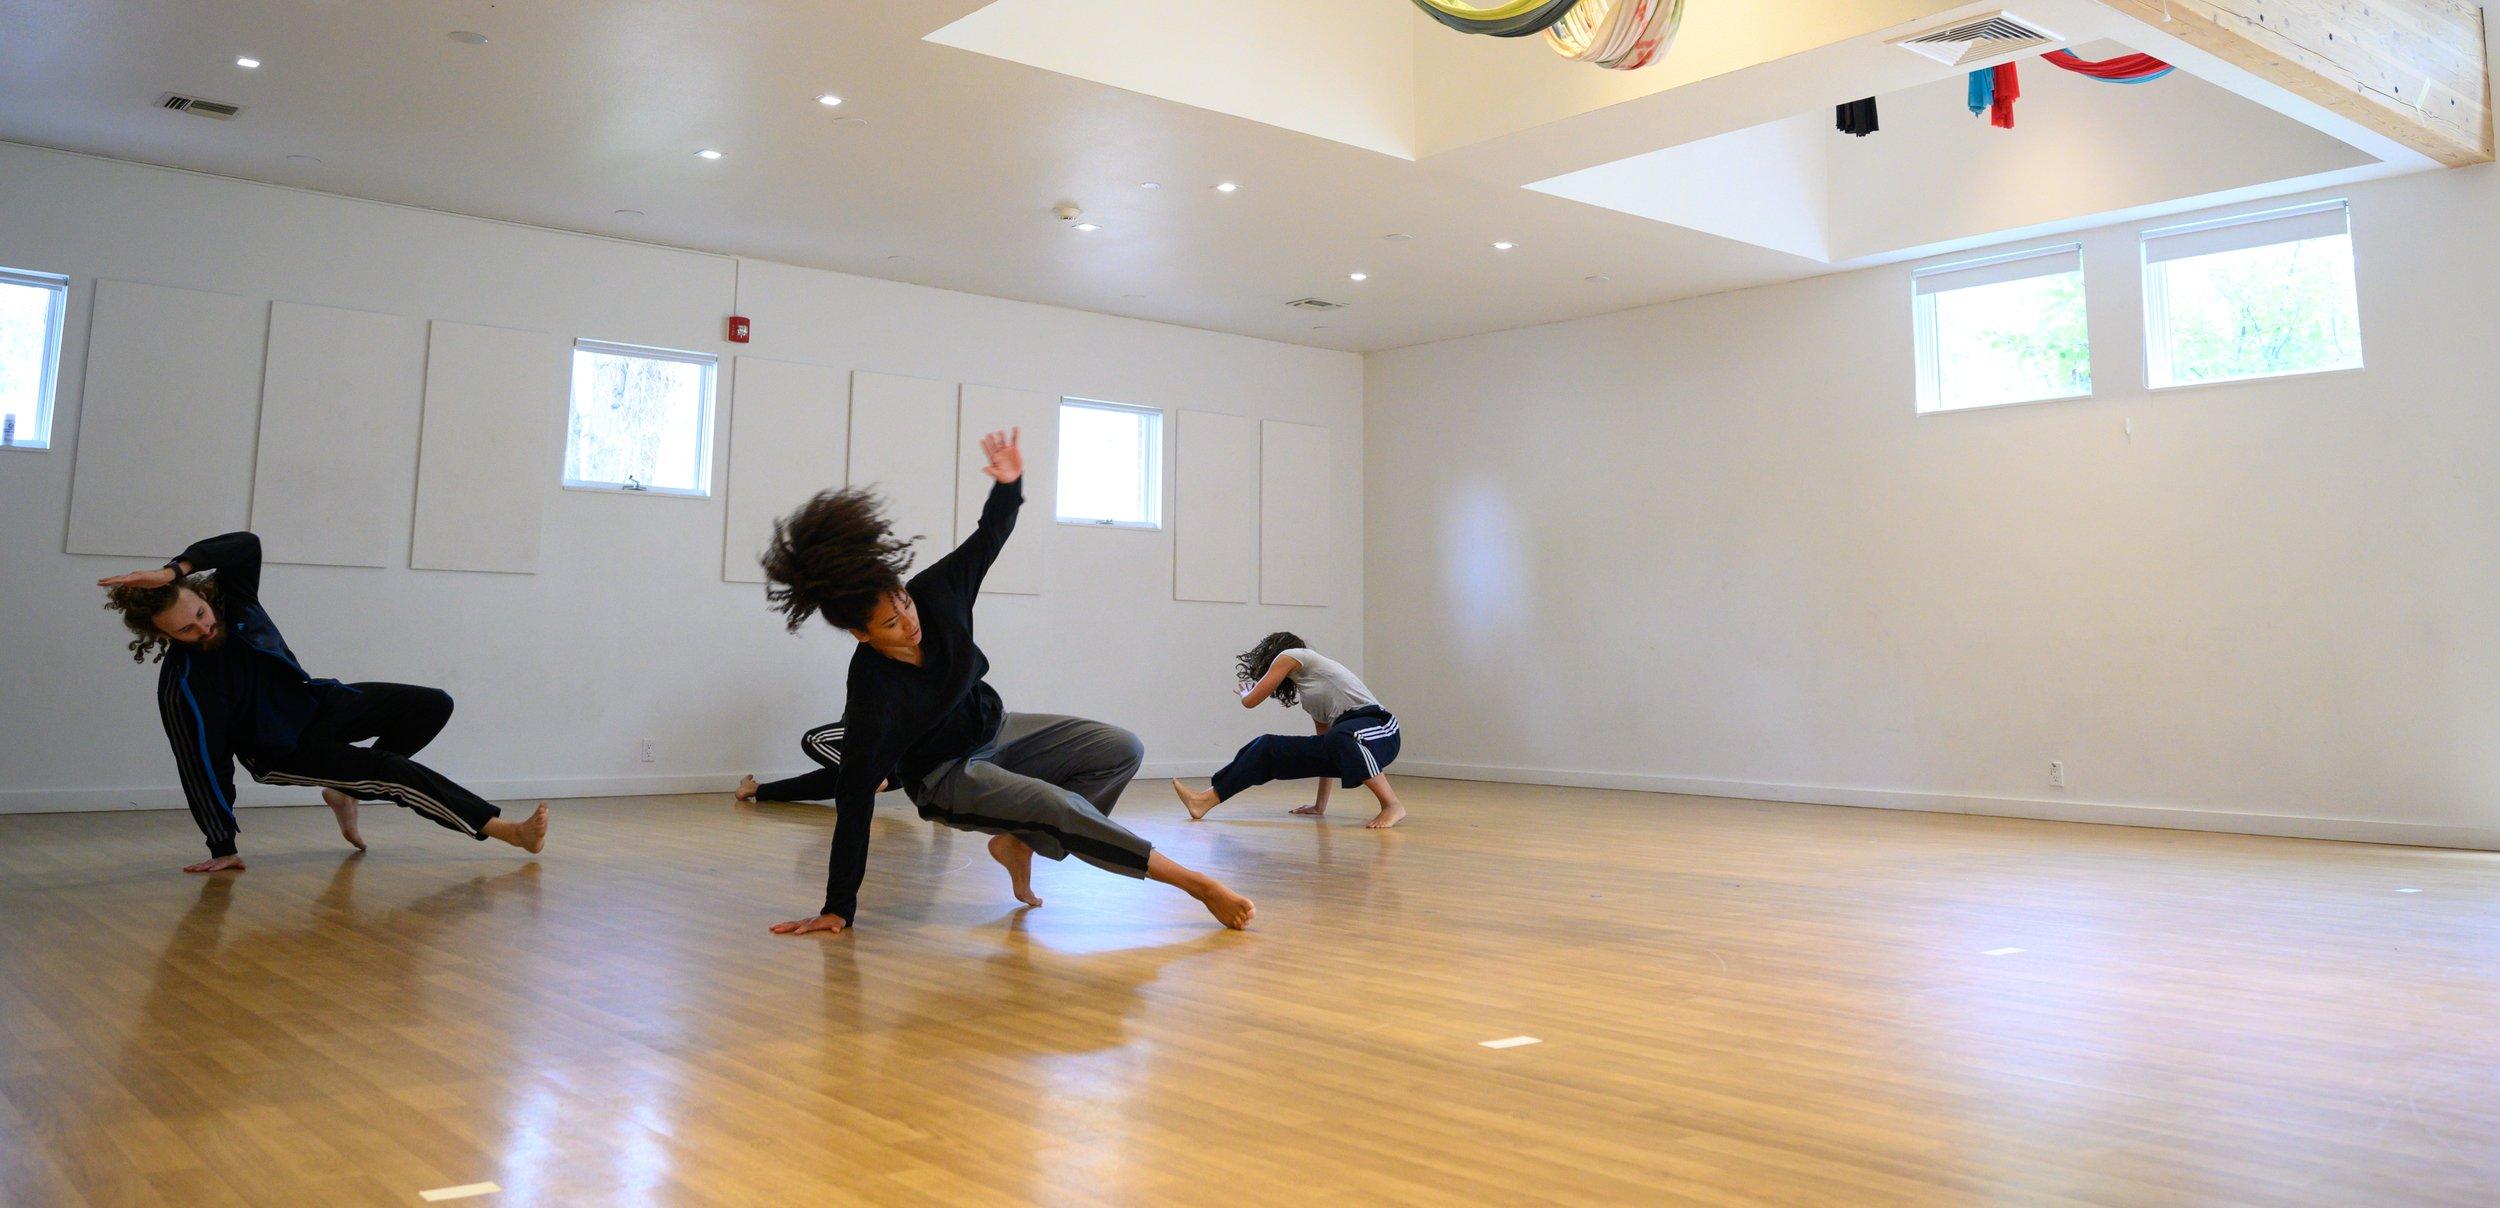 Kizuna Dance residency becomes a reality thumbnail